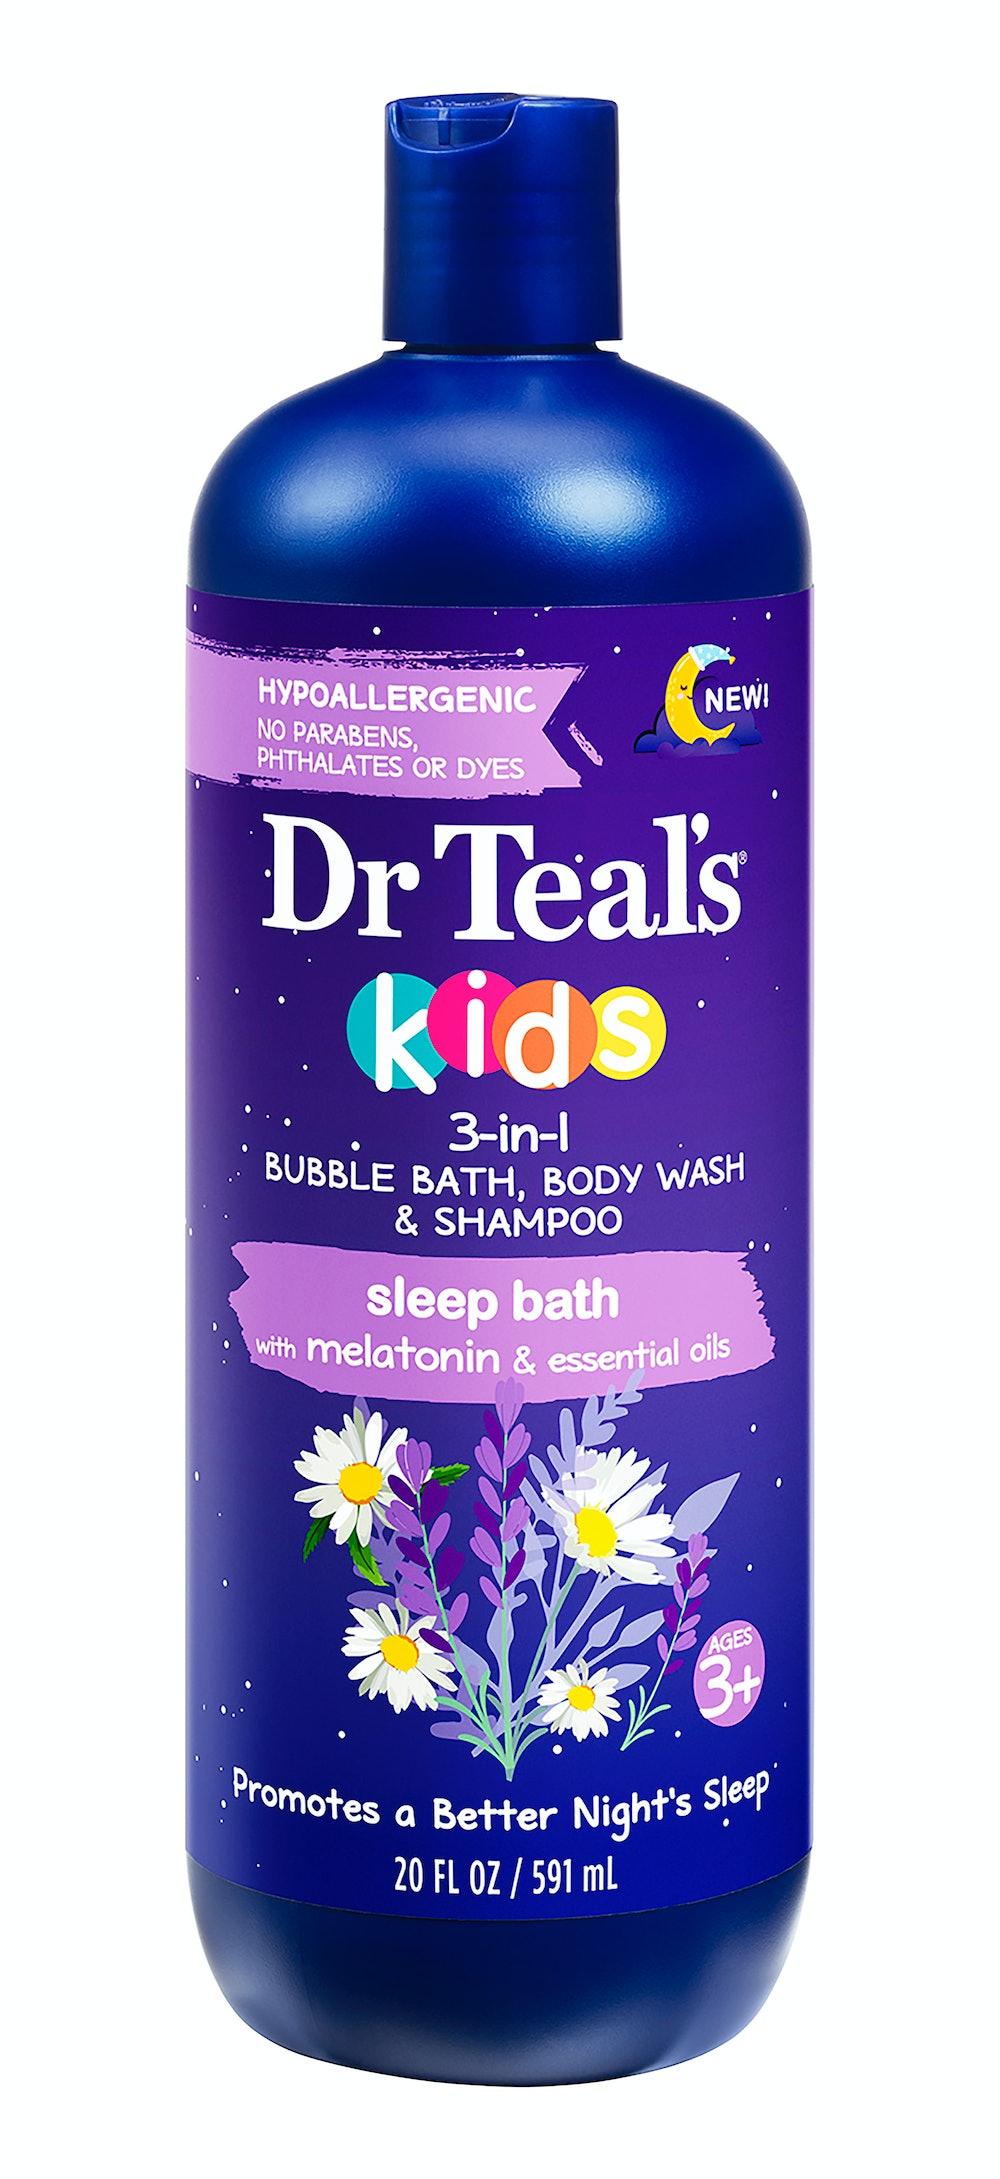 Kids Melatonin 3 in 1 Bubble Bath, Body Wash and Shampoo